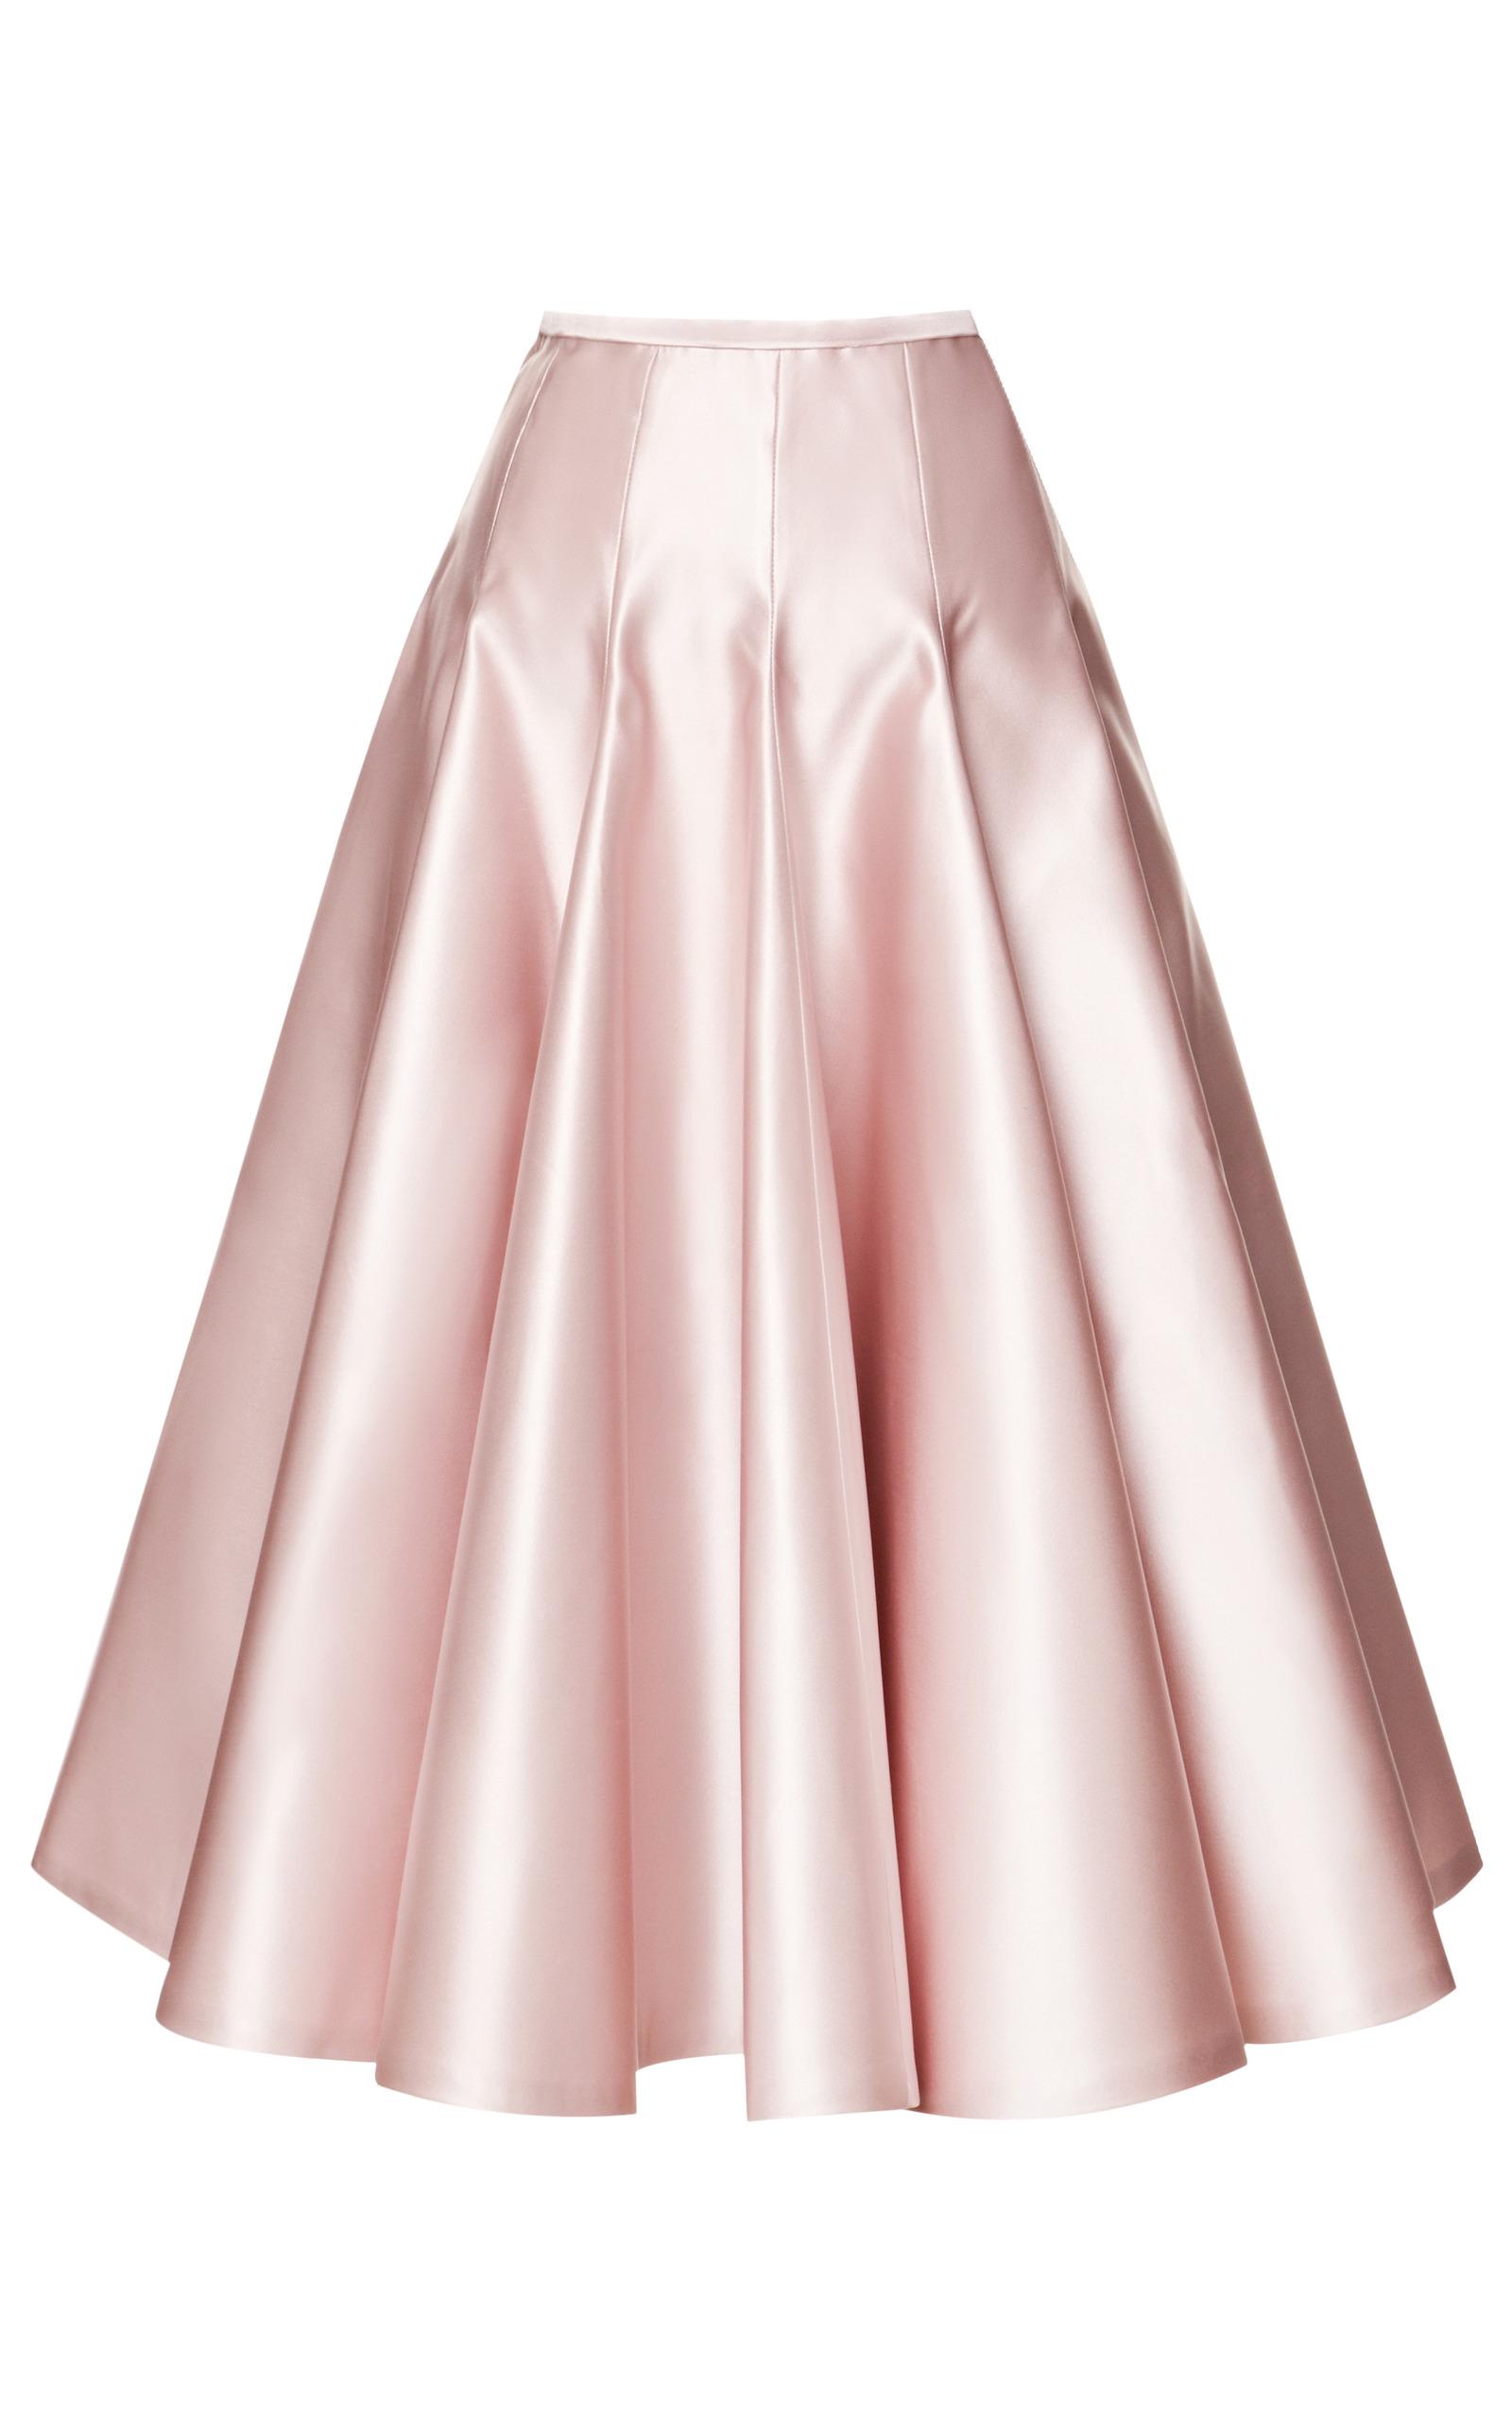 7bd1106df2 Duchesse Satin A-Line Skirt by Rochas | Moda Operandi